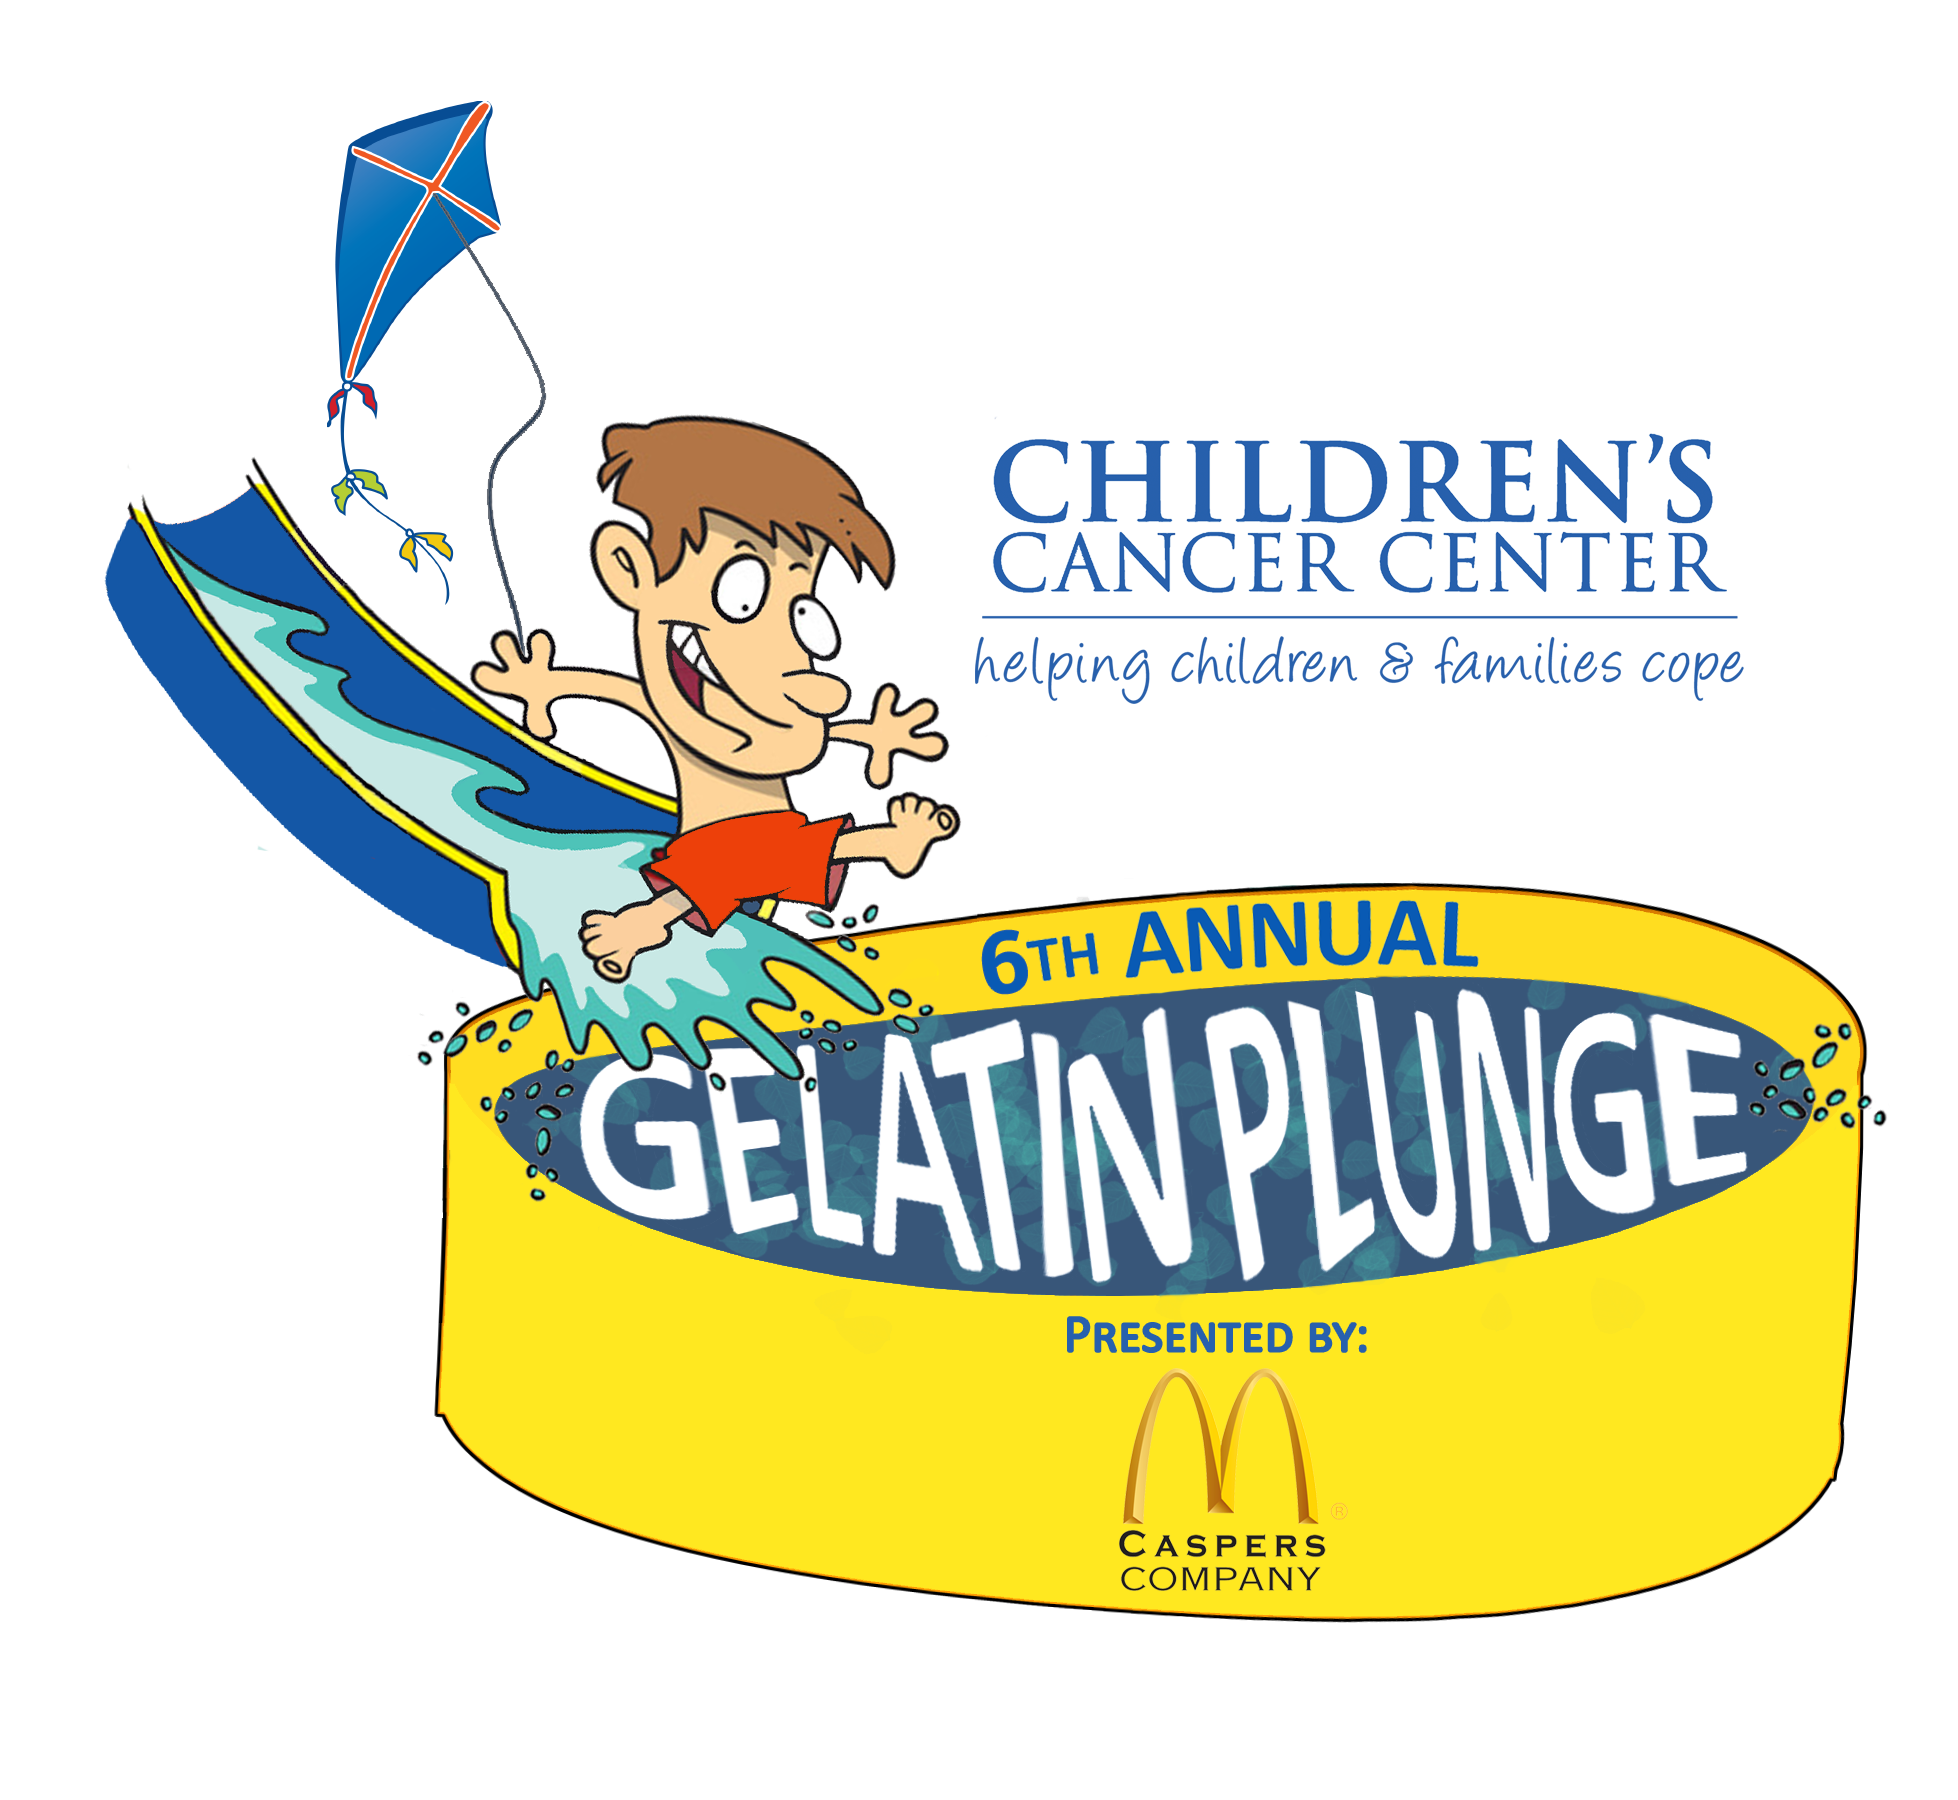 6th Annual Gelatin Plunge